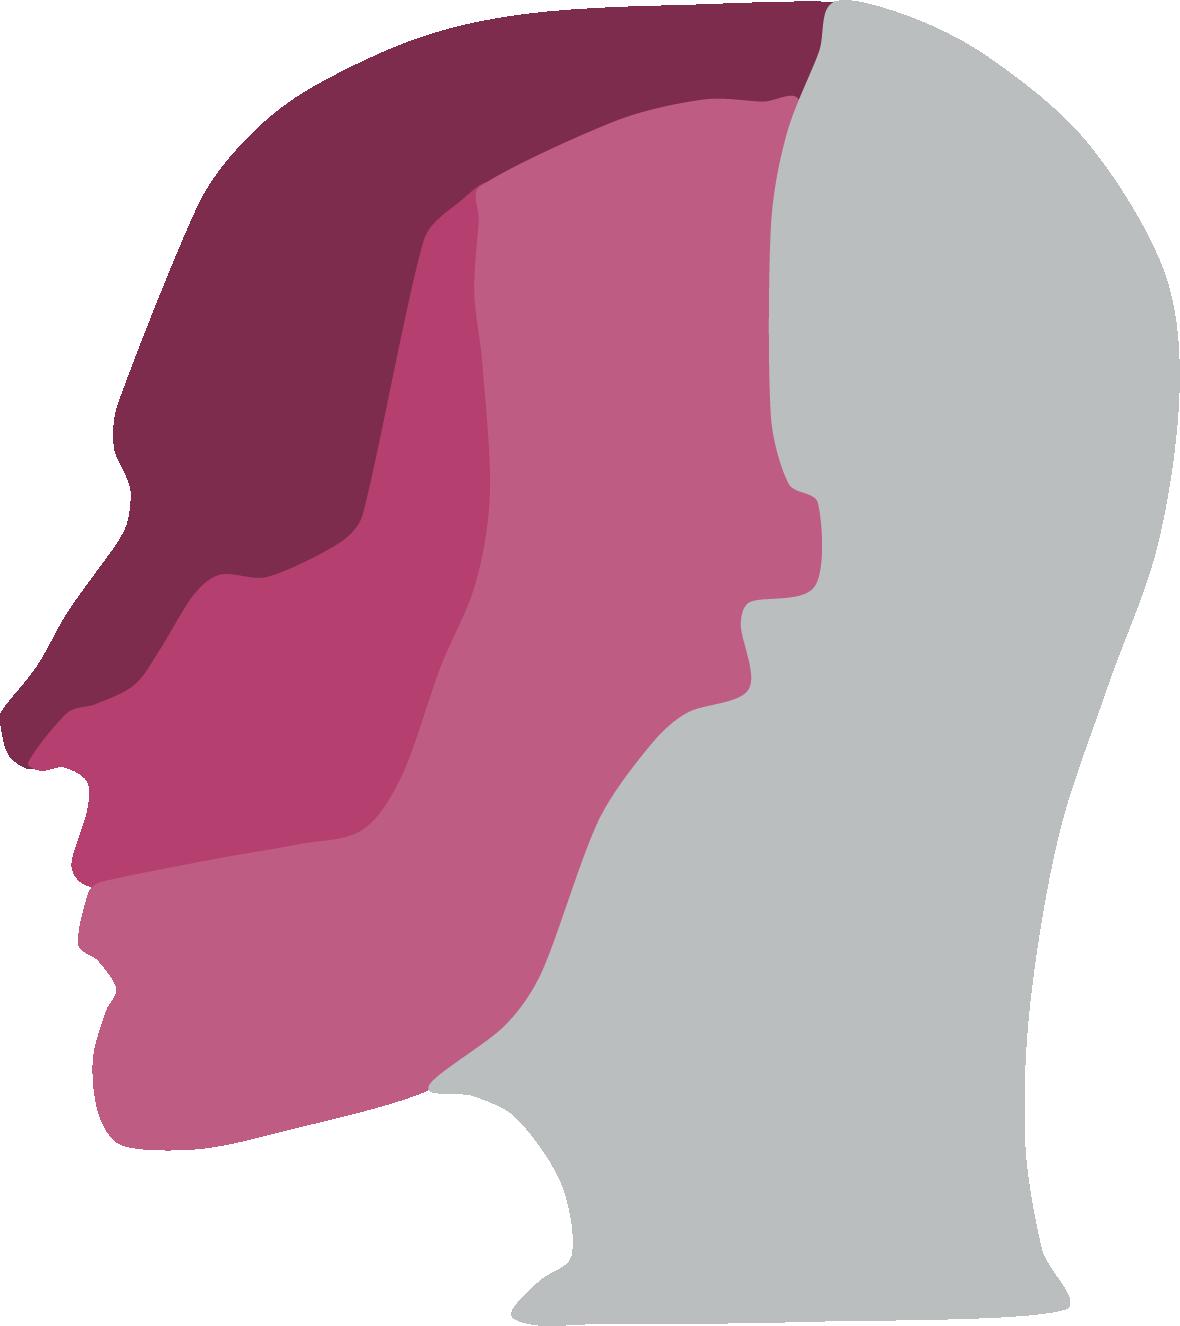 Headache and Migraine Specialists